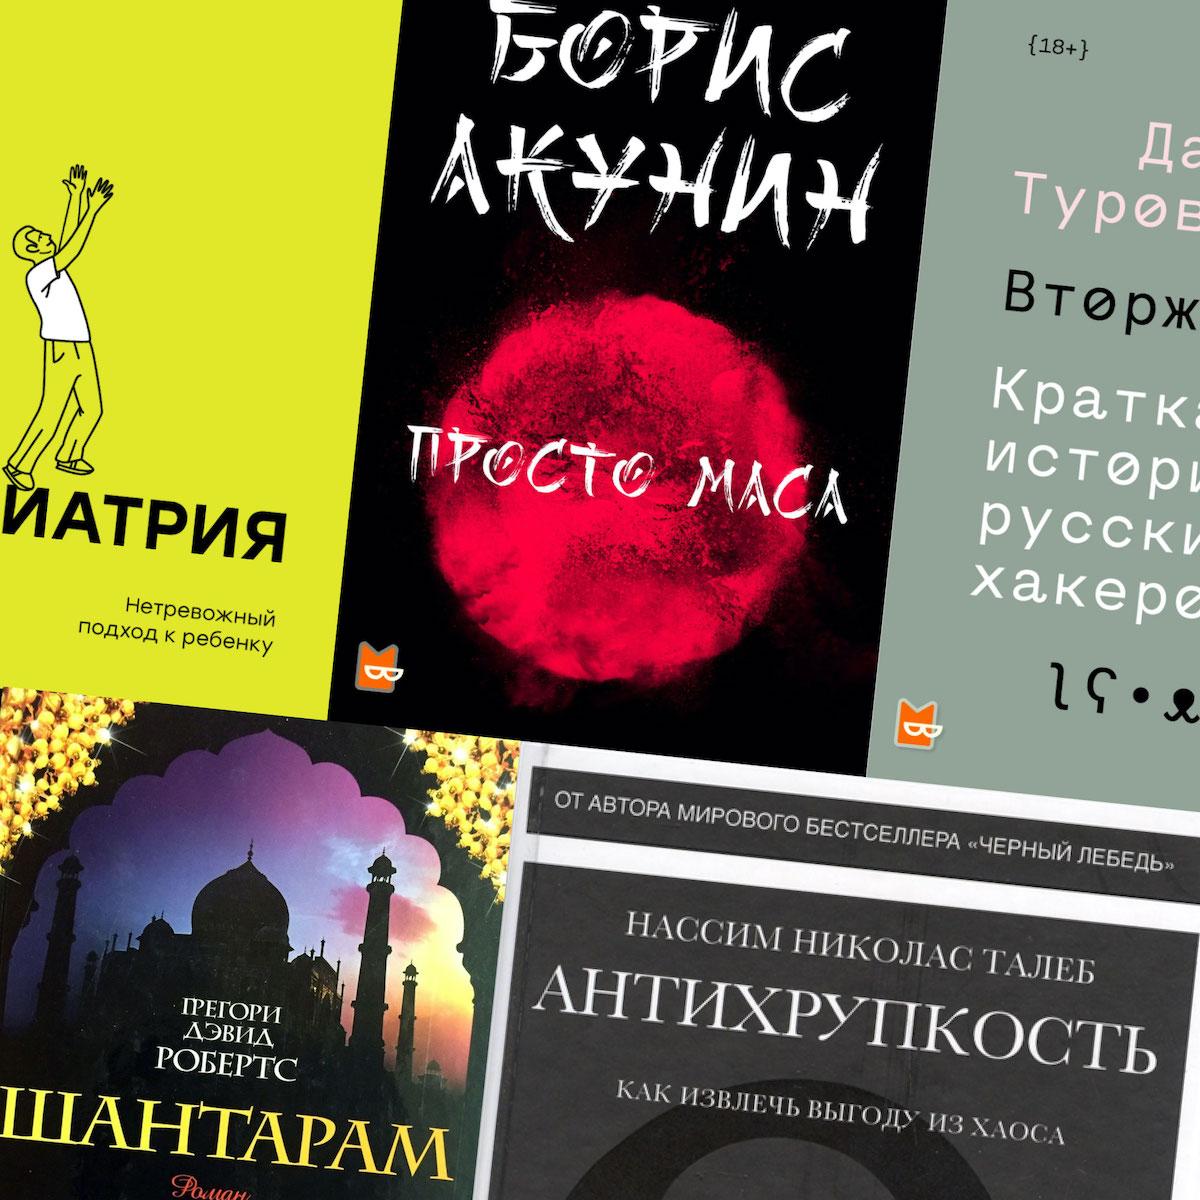 Обложки книг: «Федиатрия», «Просто Маса», «Вторжение», «Шантарам», «Антихрупкость»